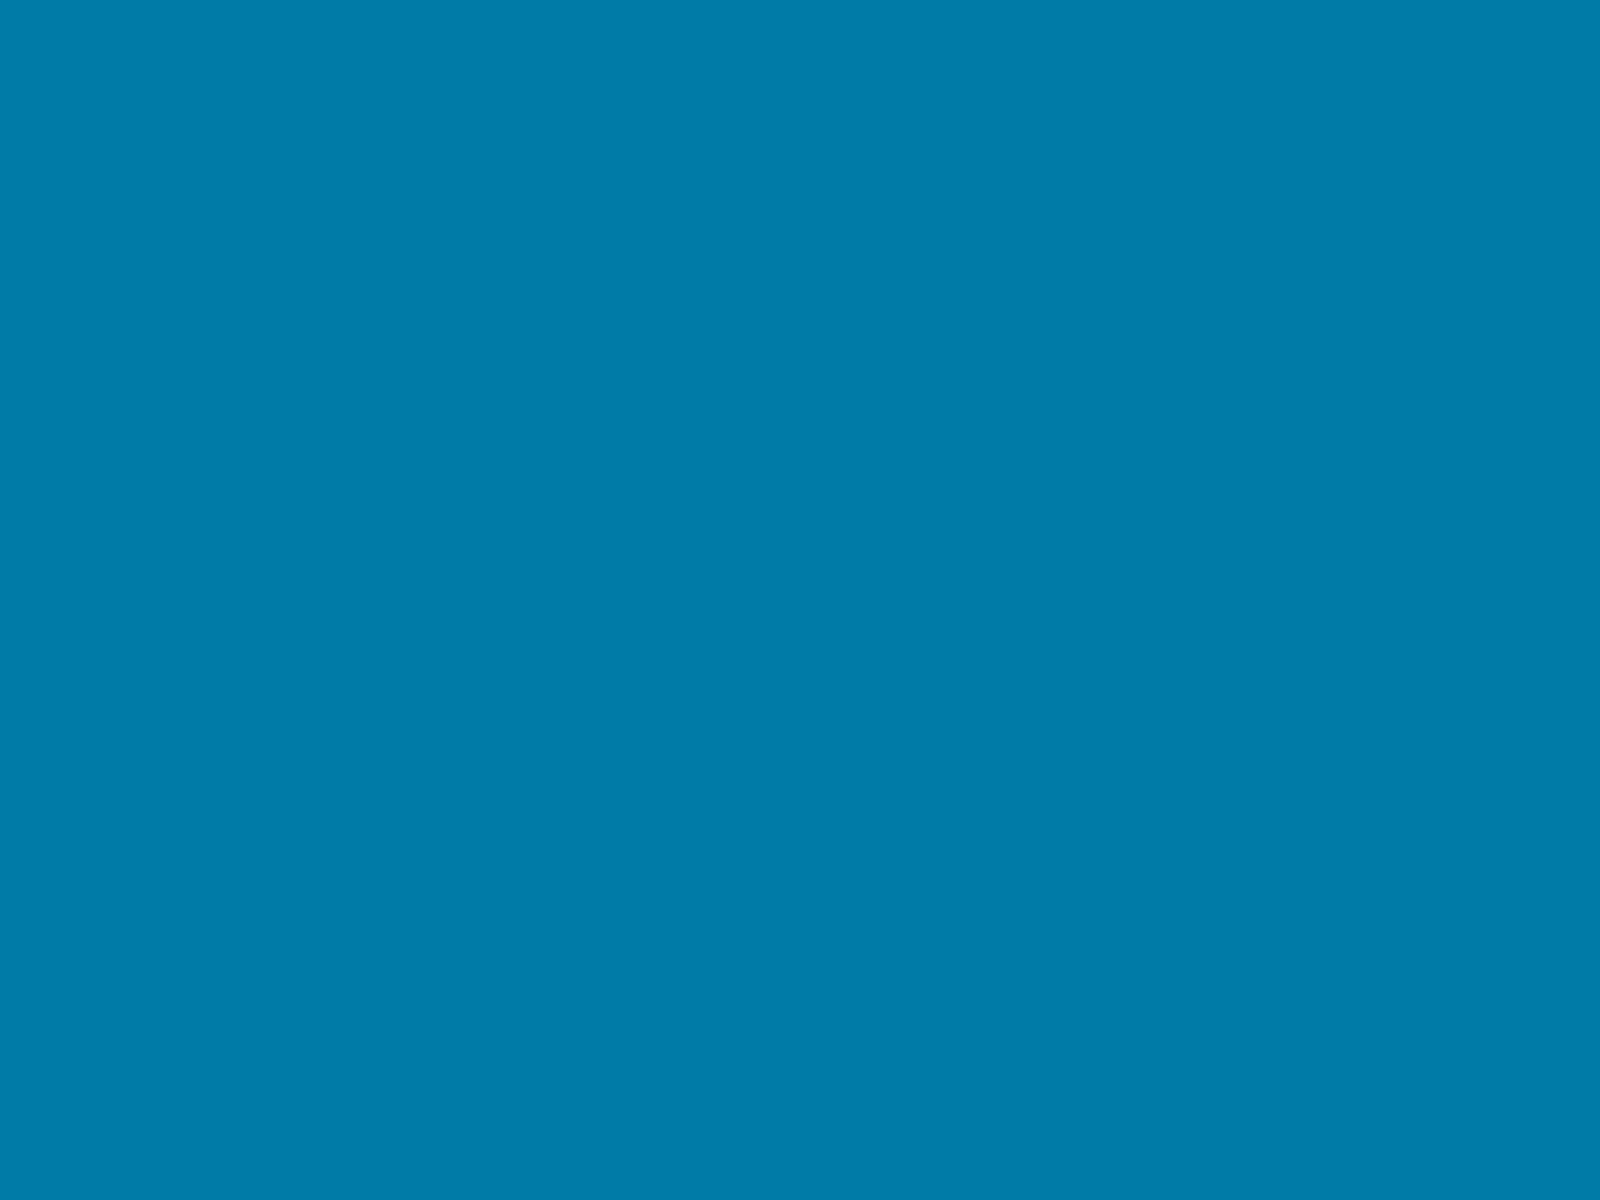 1600x1200 Celadon Blue Solid Color Background